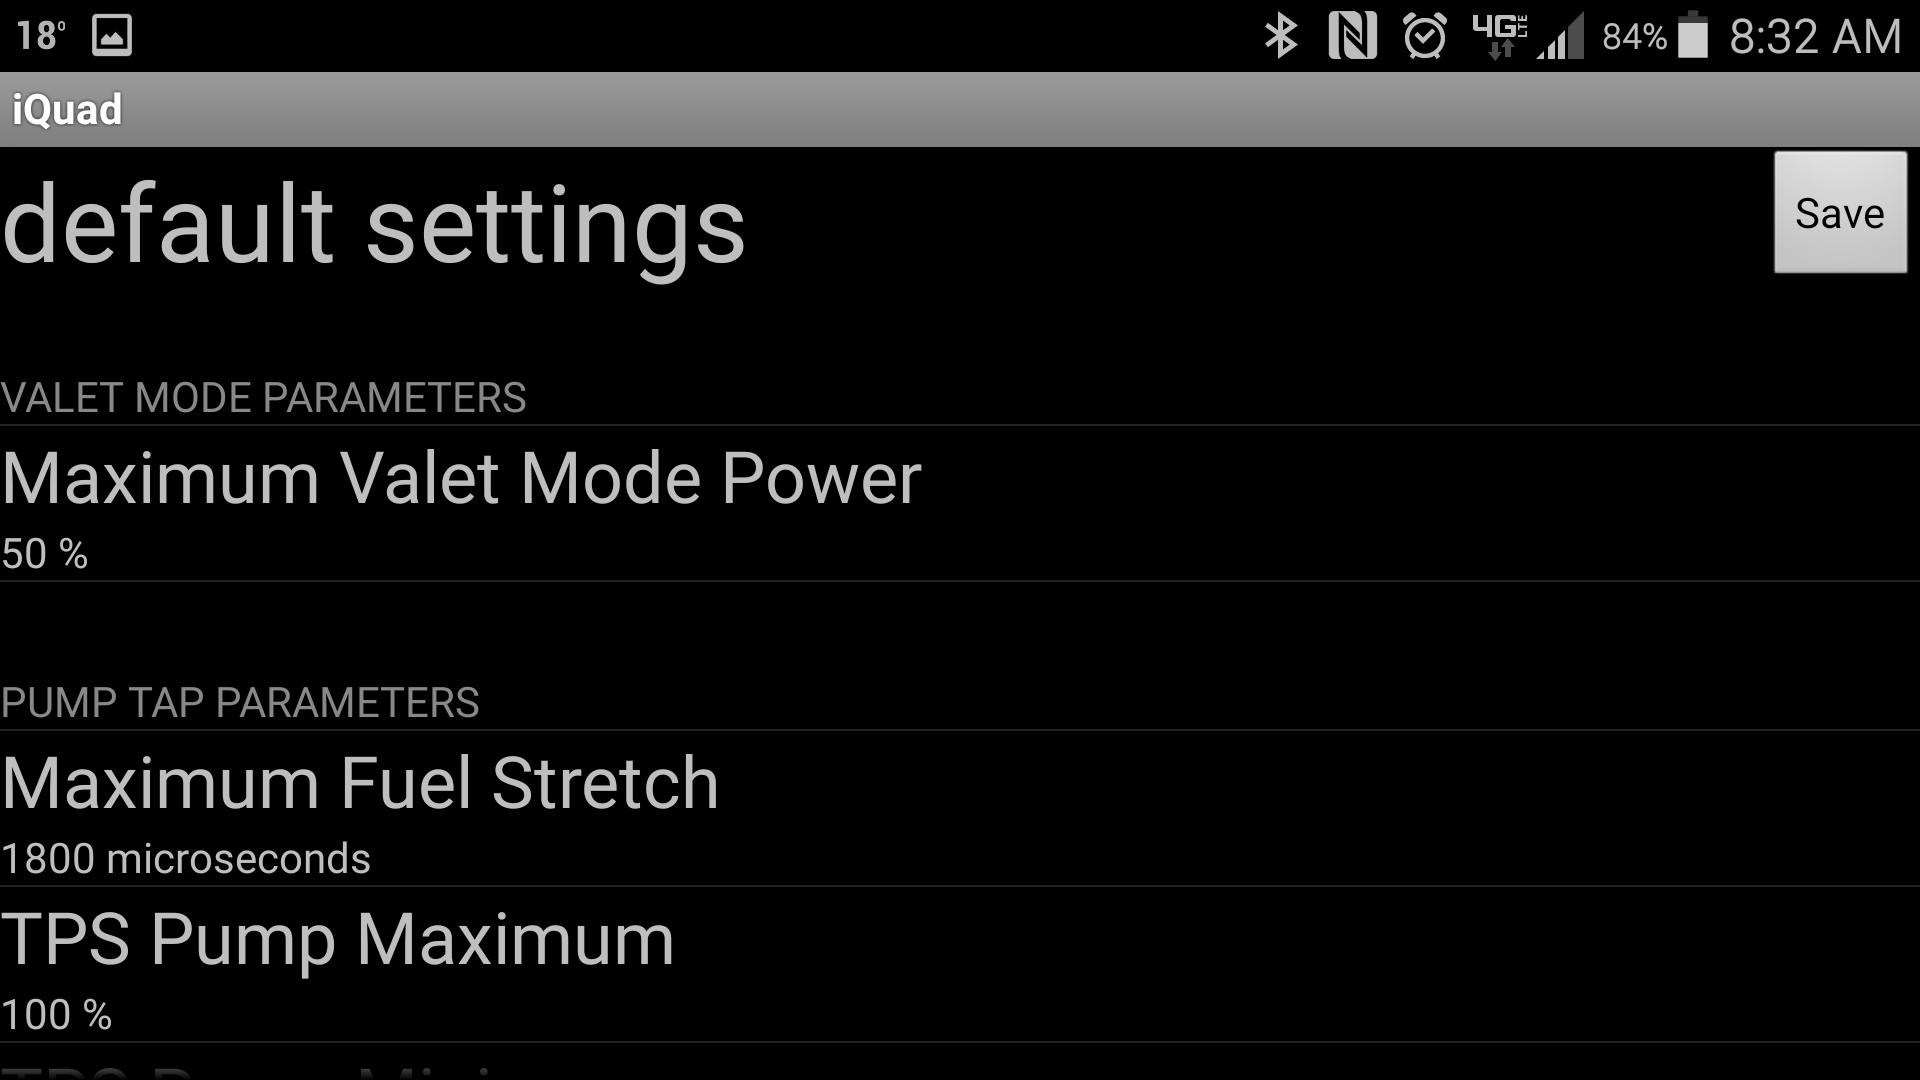 valet-mode-parameters.png